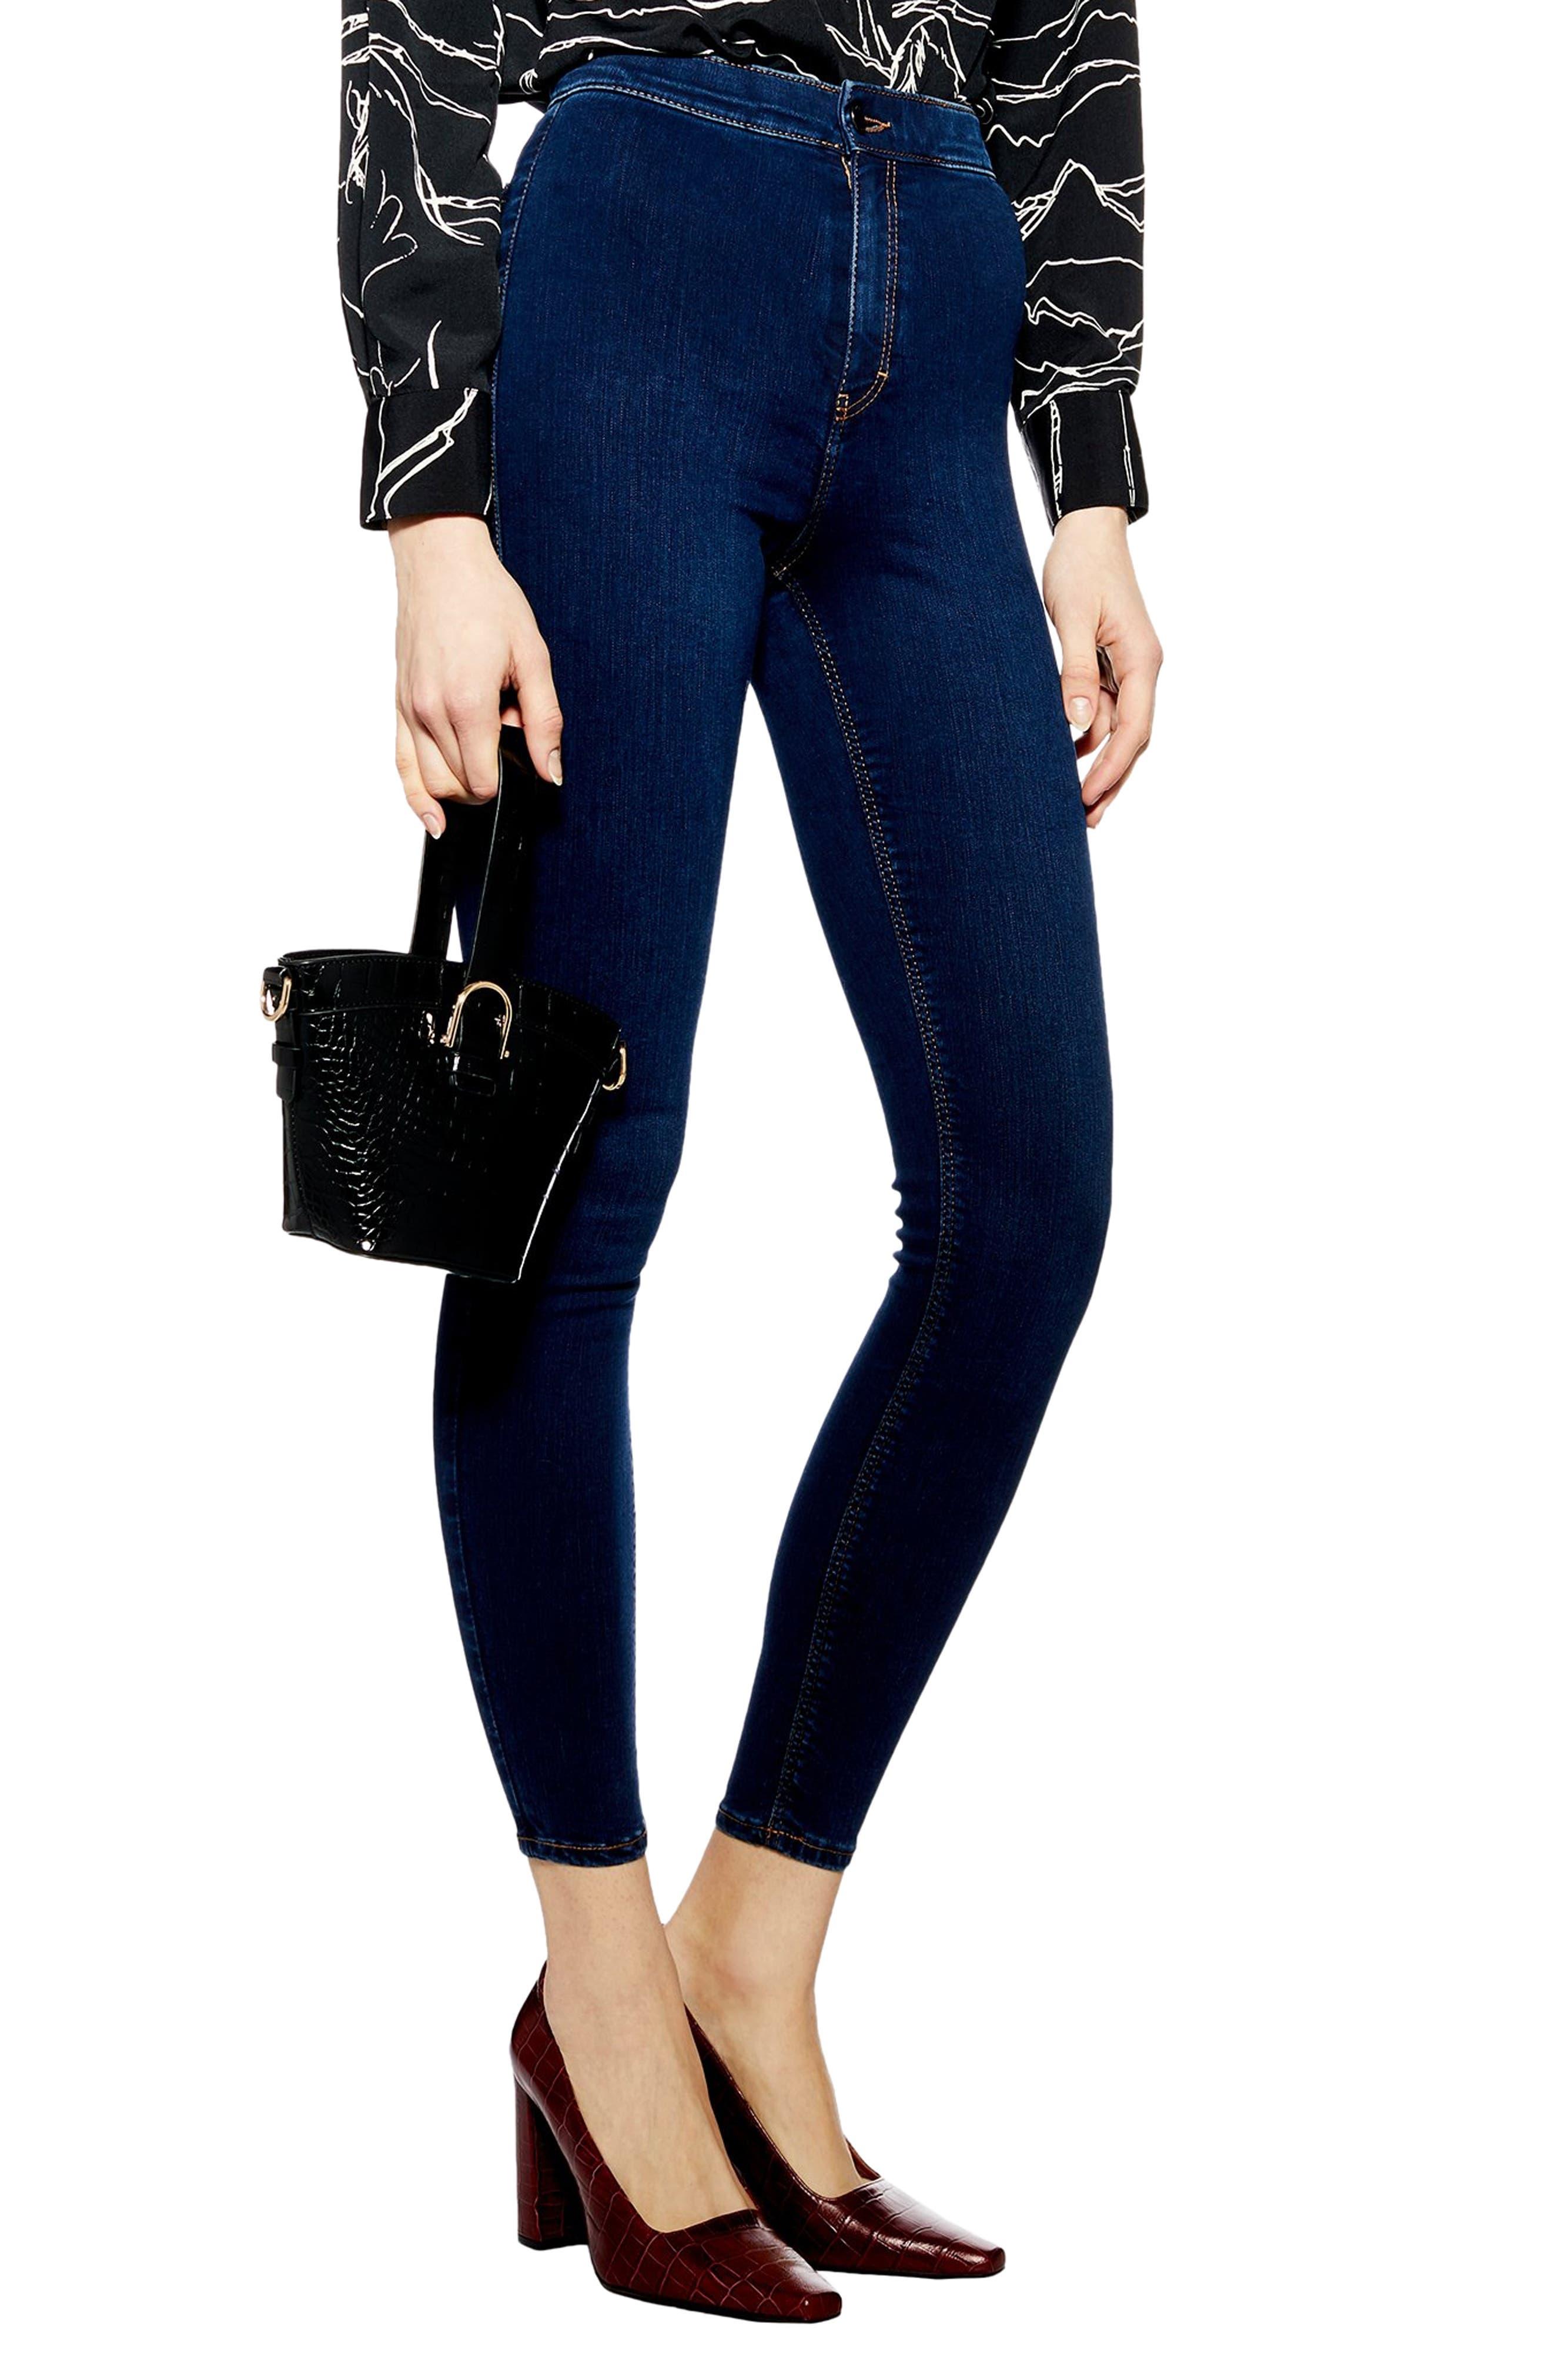 Topshop Joni High Waist Jeans